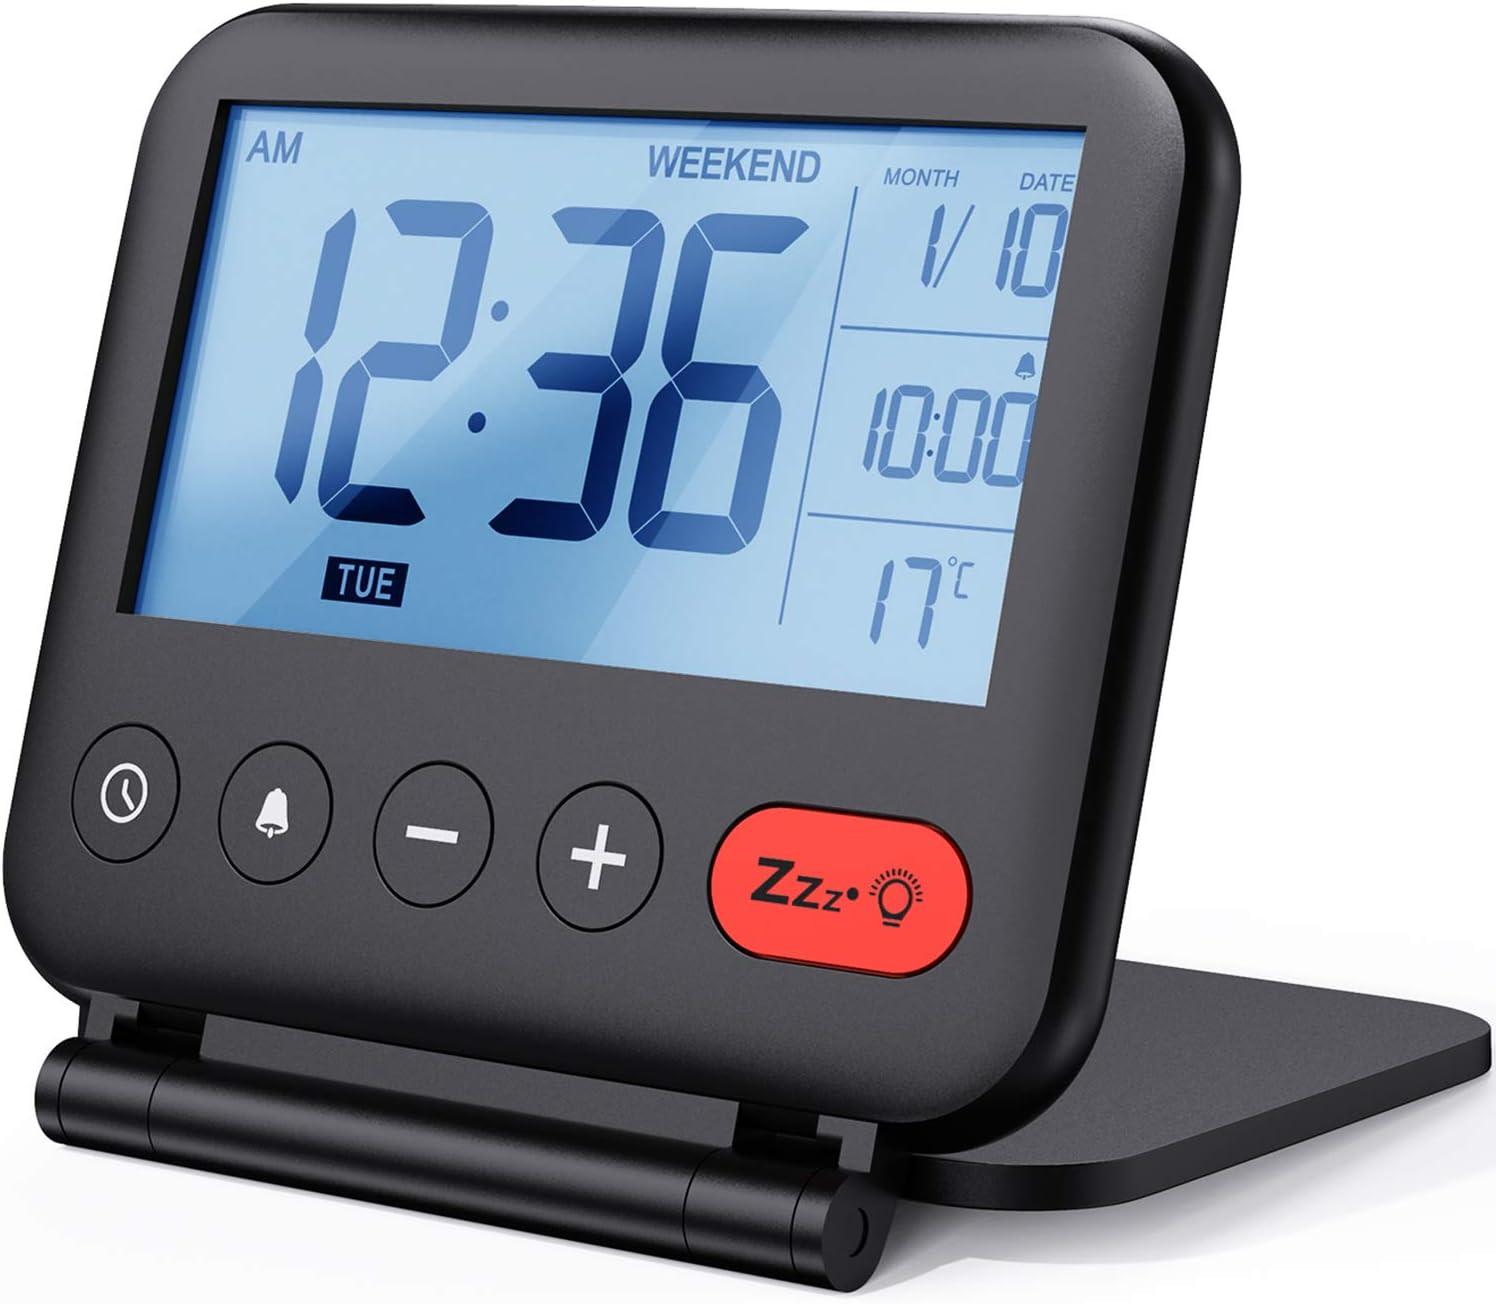 NOKLEAD Reloj despertador digital de viaje - Mini reloj pantalla LCD portátil calendario retroiluminado, Temperatura del calendario espejos cosméticos, reloj de escritorio plegable (negro)